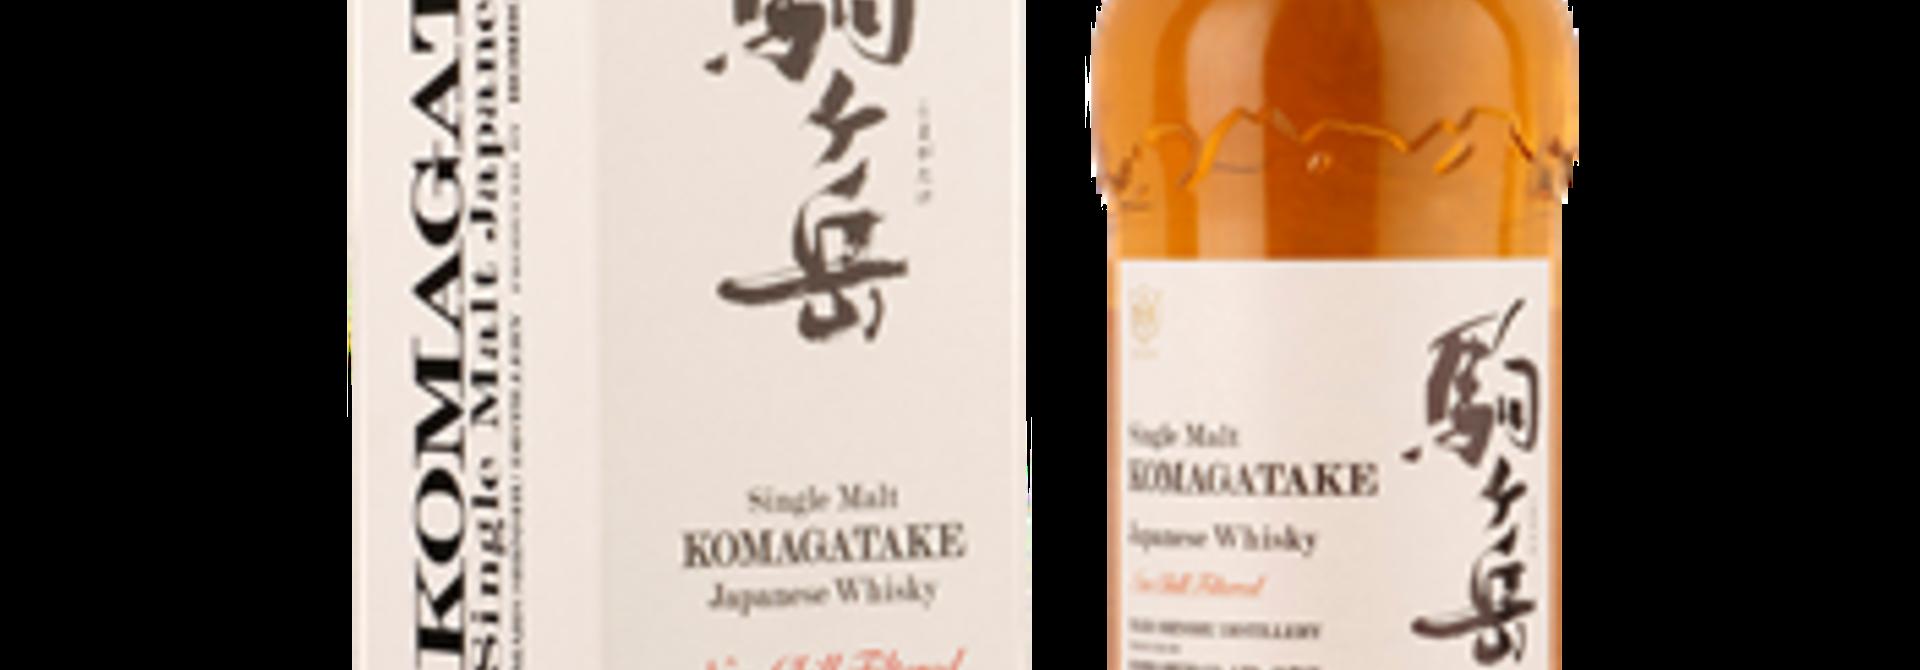 Mars Komagatake limited Edition 2020 0.7ltr